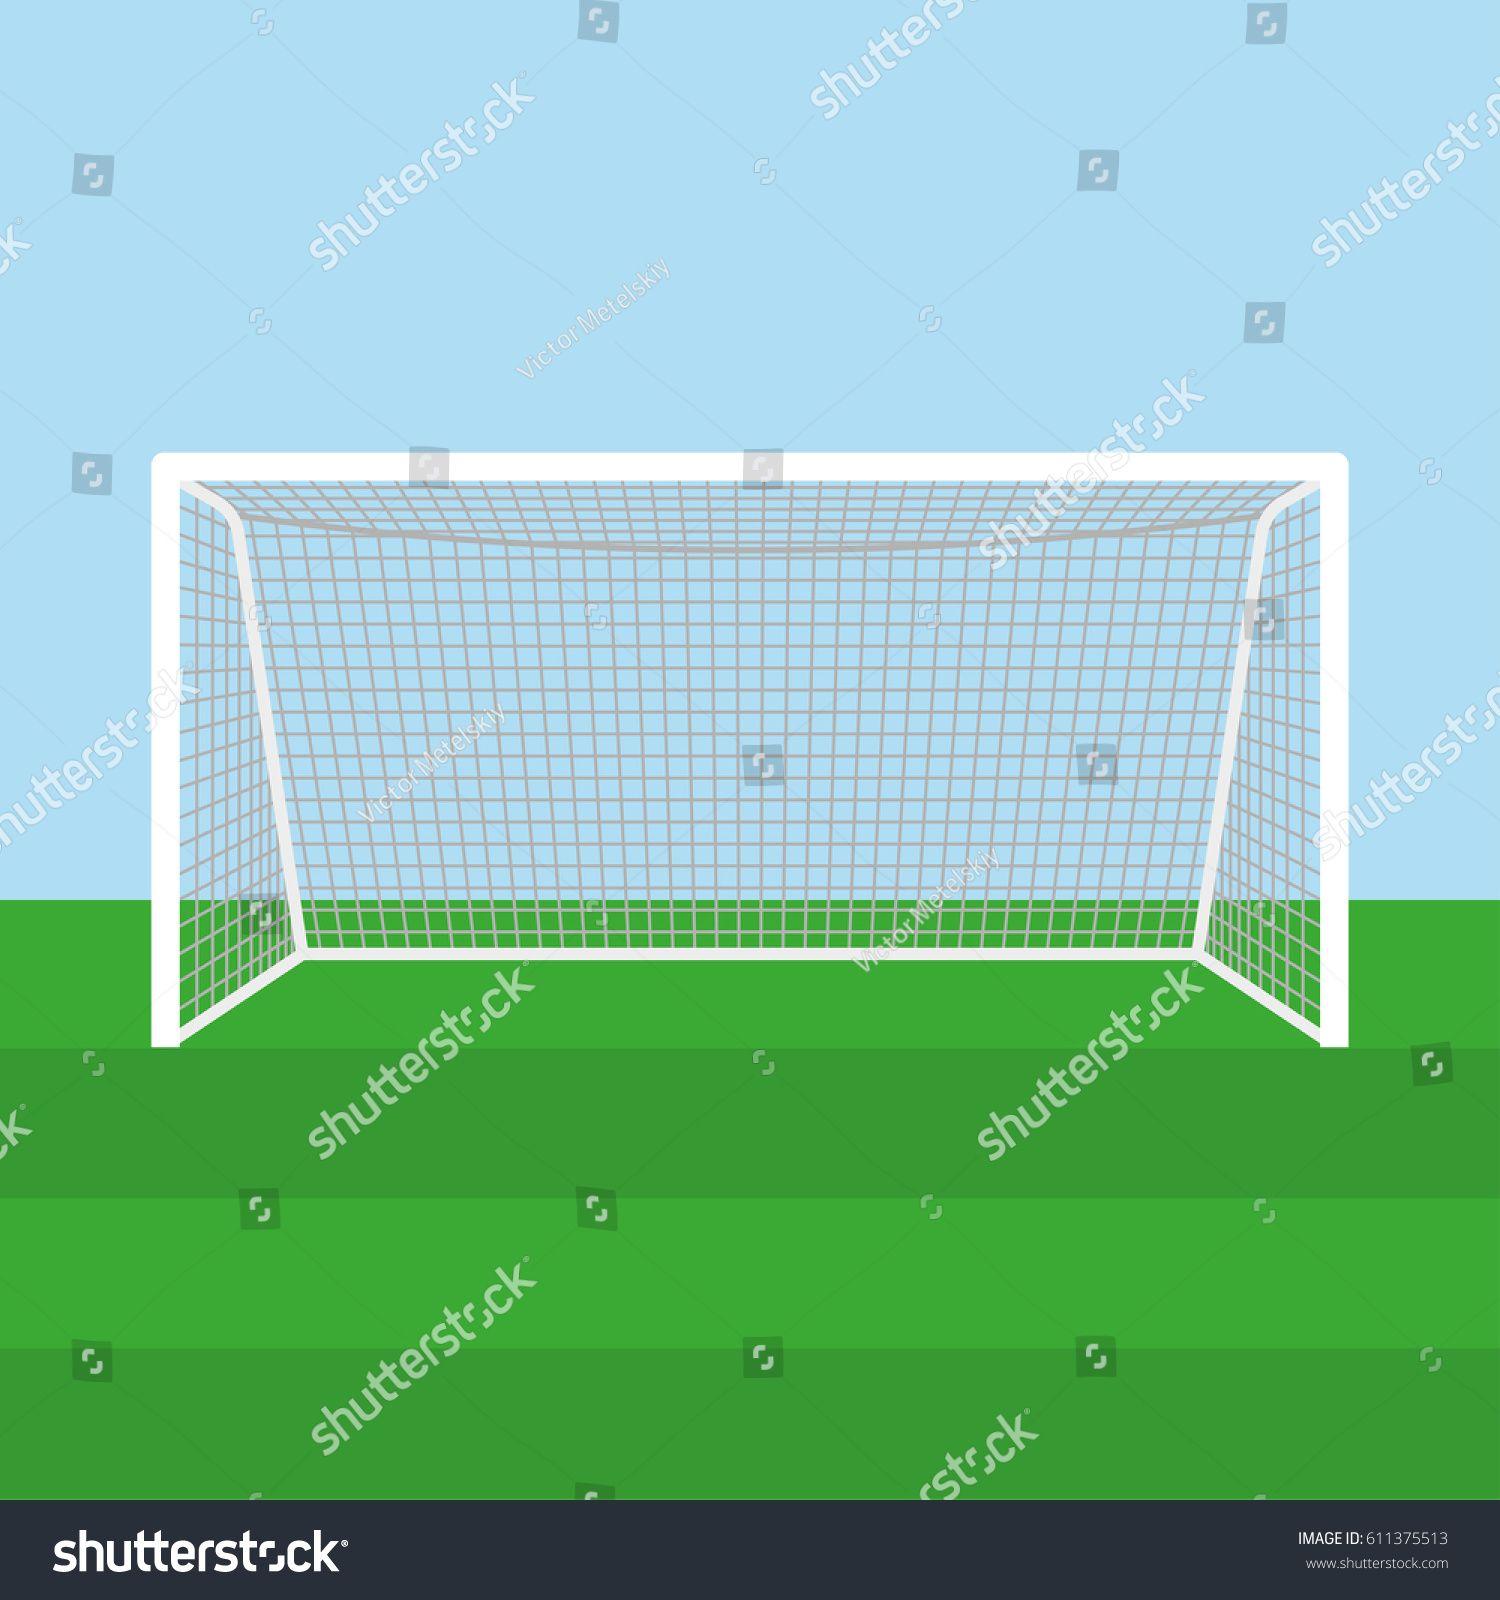 Soccer Goal Or Football Goal Vector Illustration Ad Ad Goal Soccer Football Illustration Goals Football Soccer Goal Football Illustration